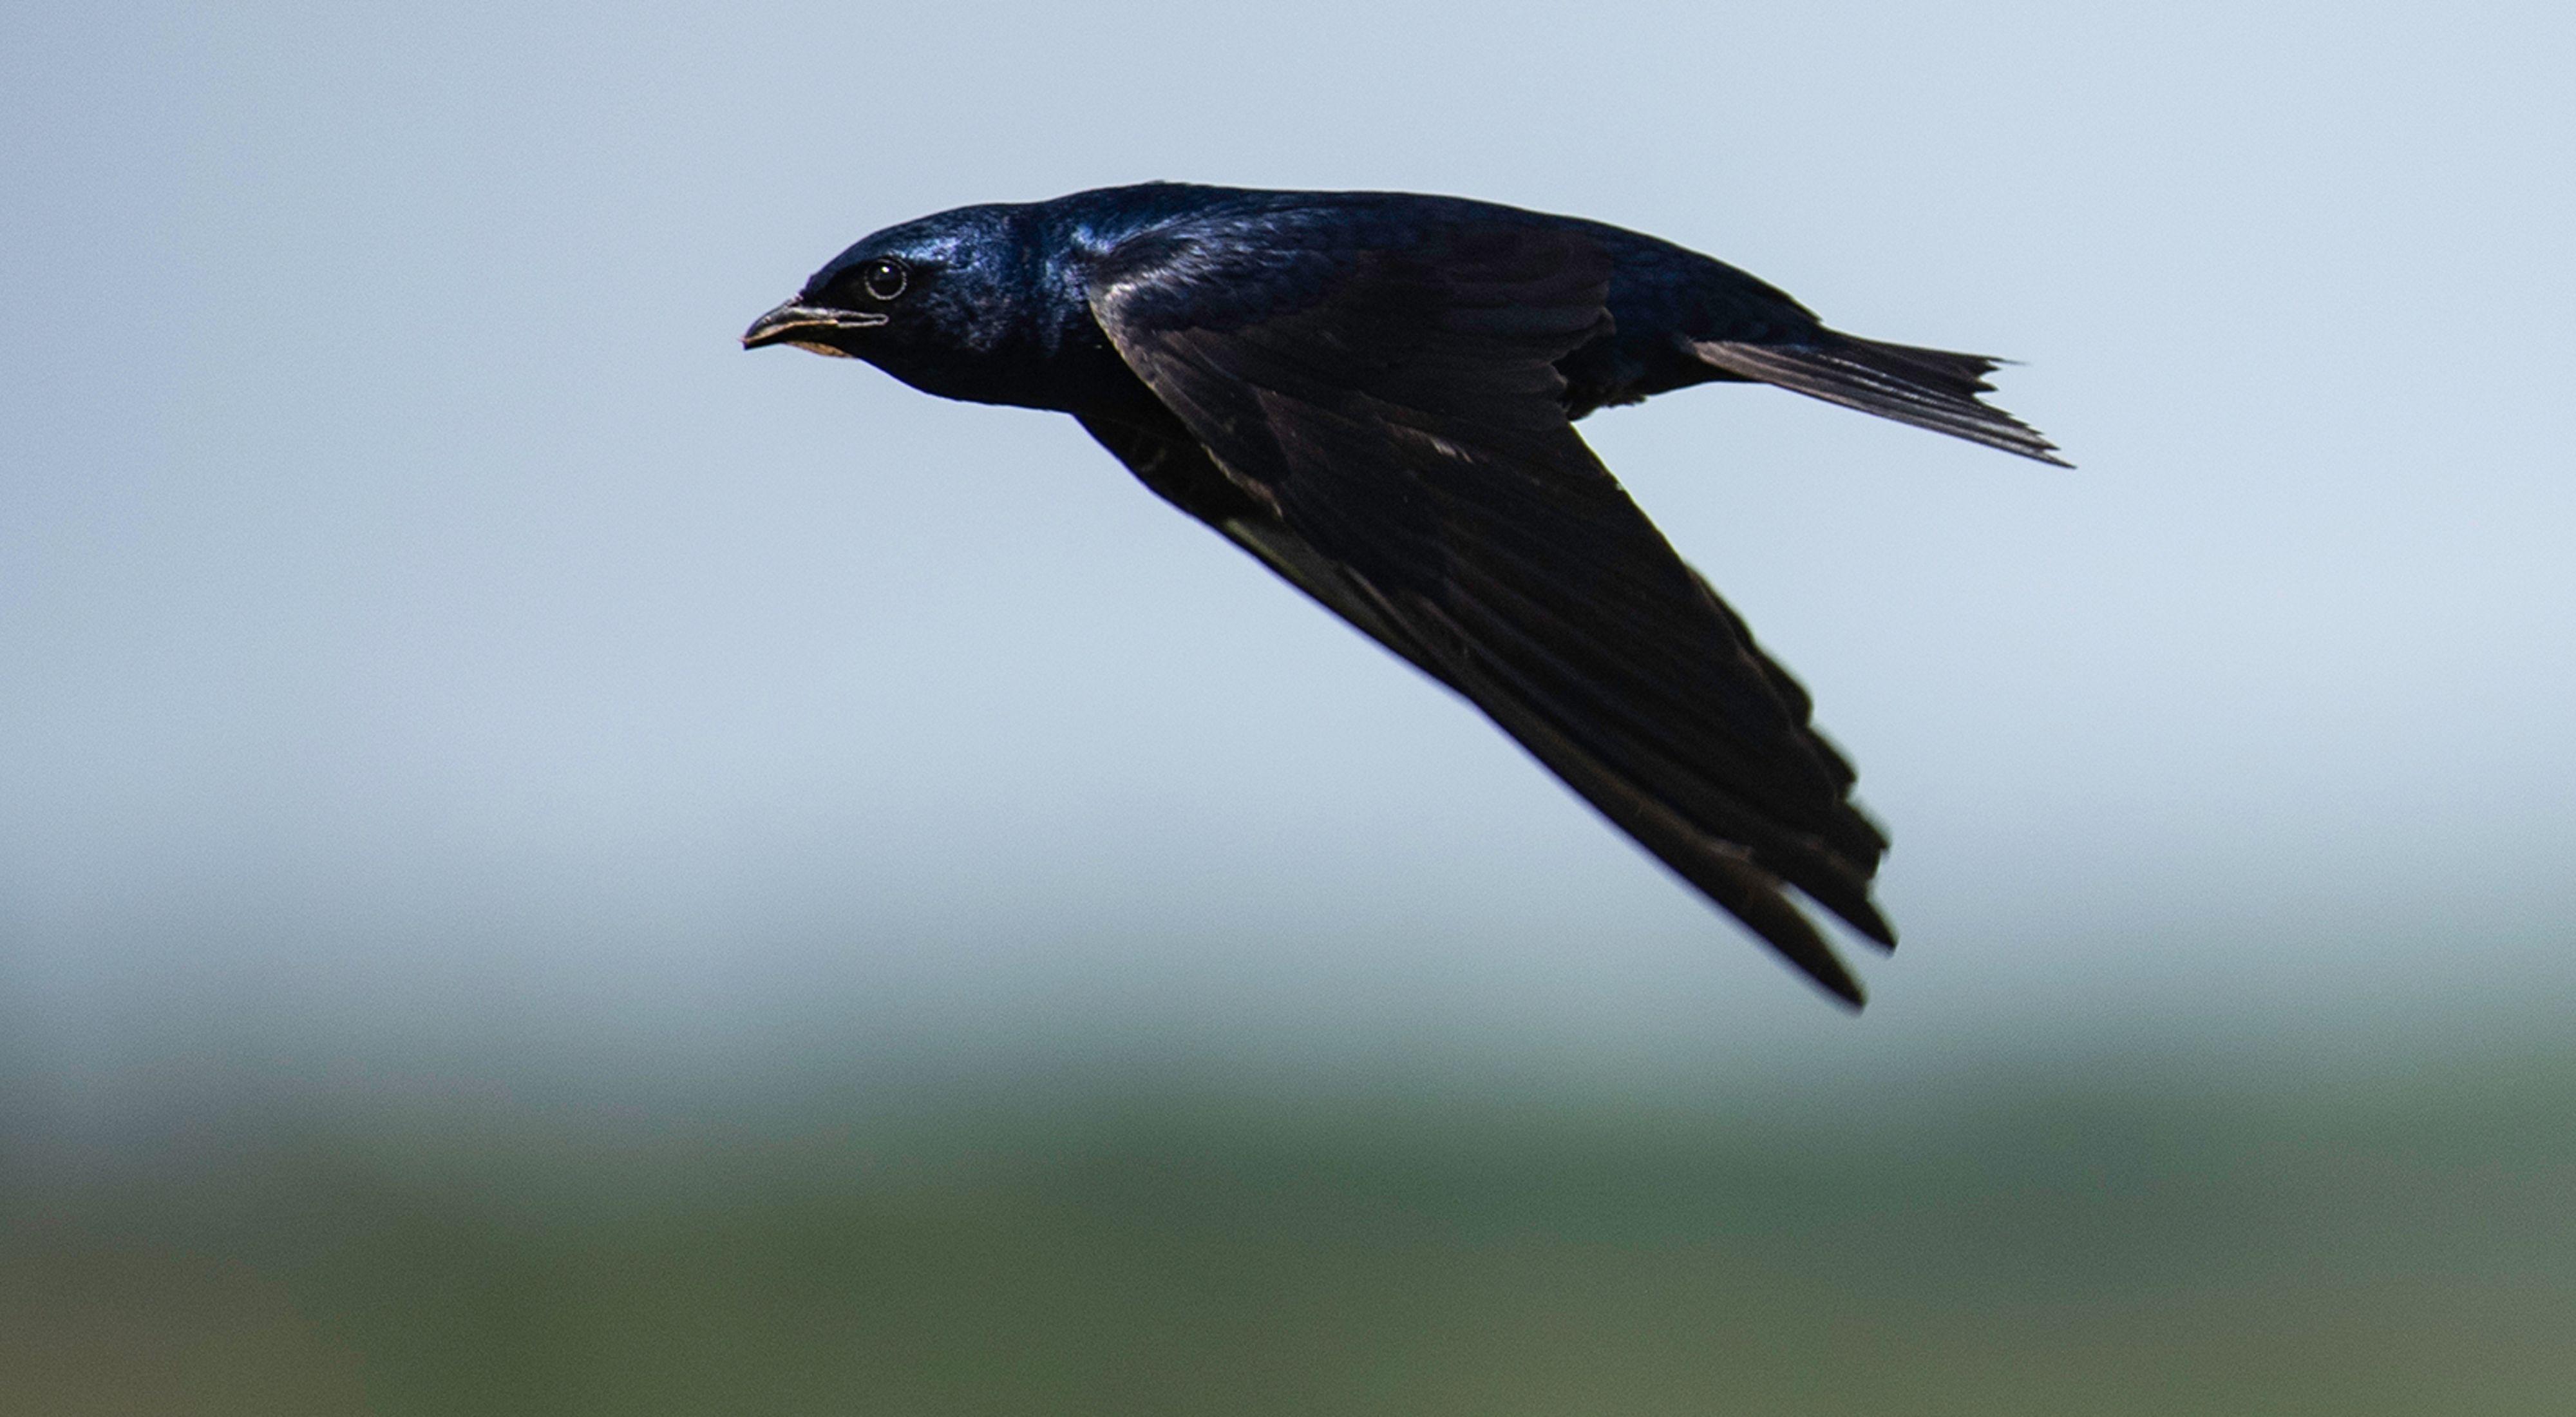 A bird flies through the air.